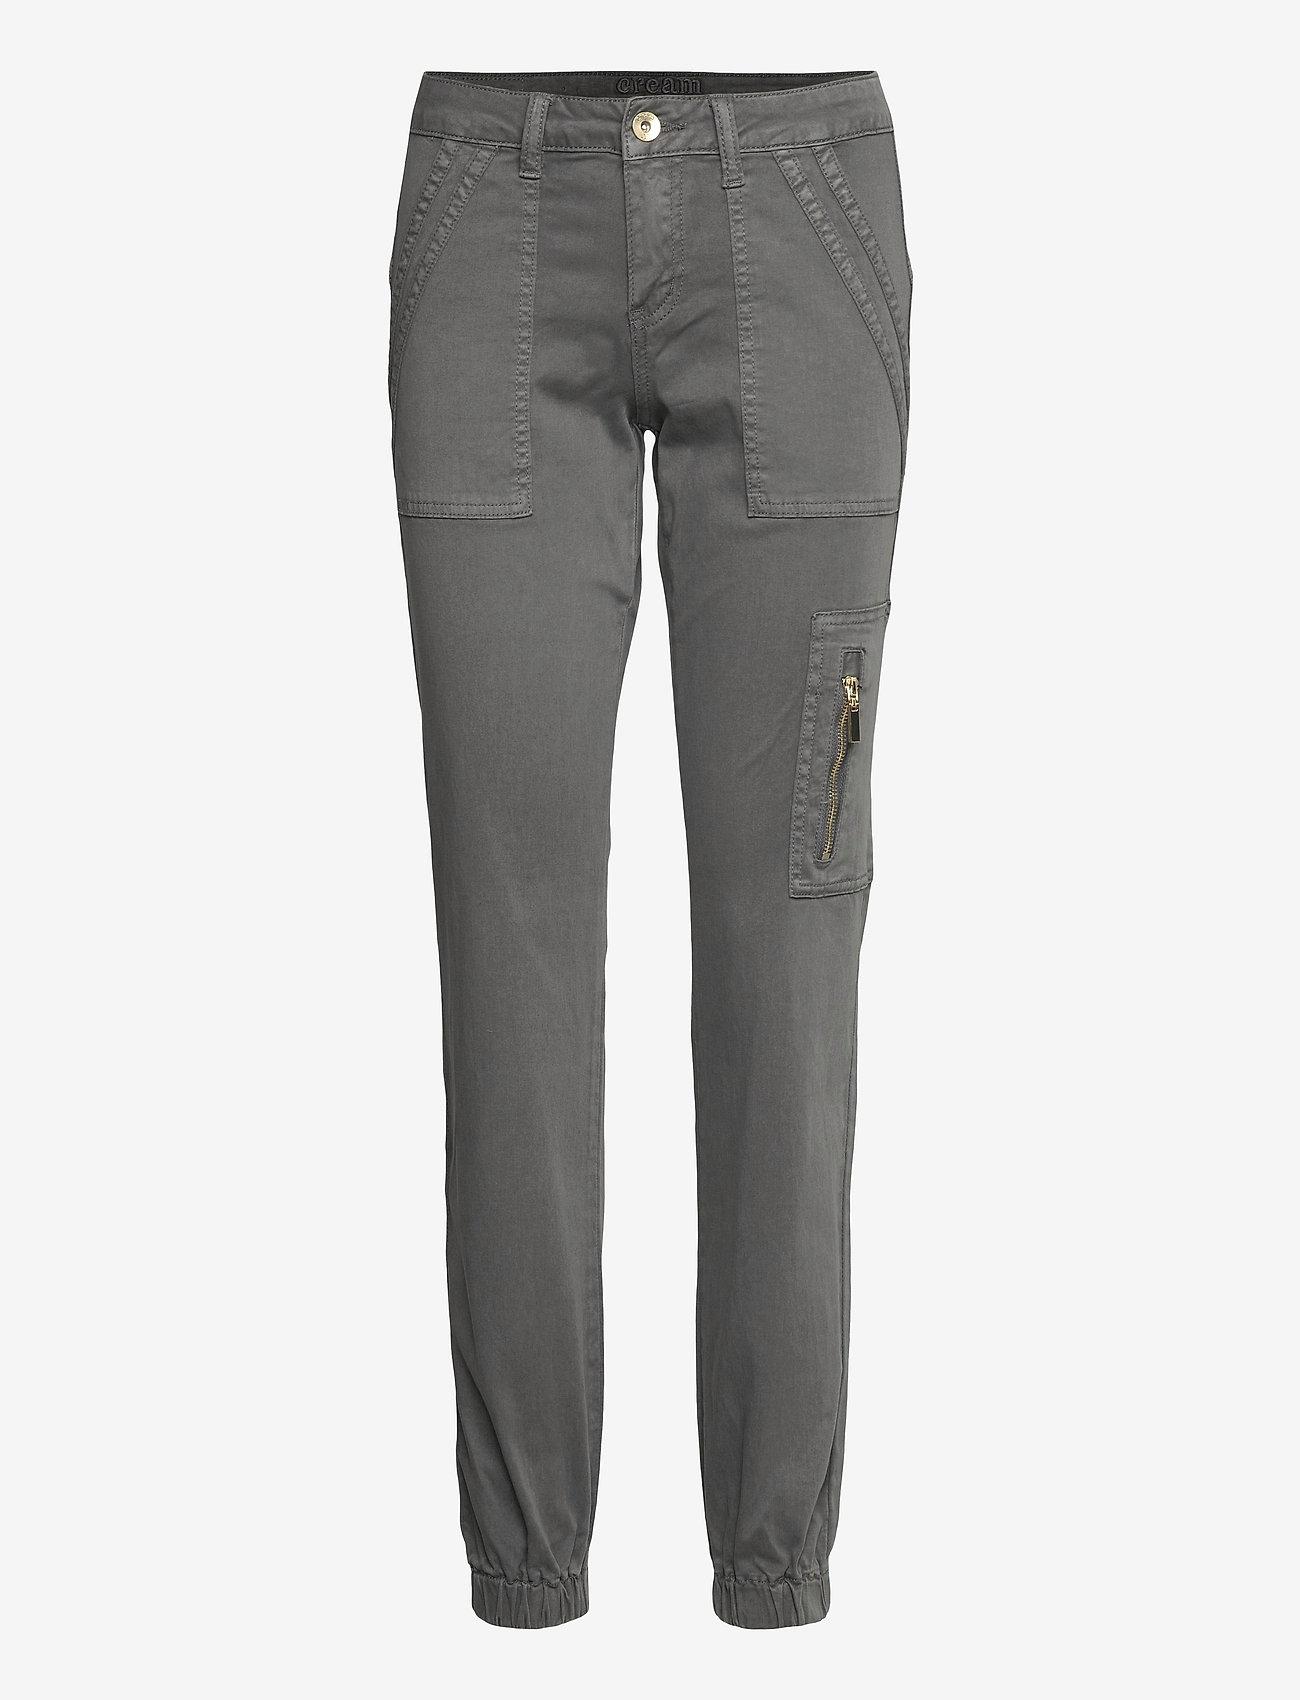 Cream - CRDafnie Jeans - Coco Fit - straight regular - eiffel tower - 0